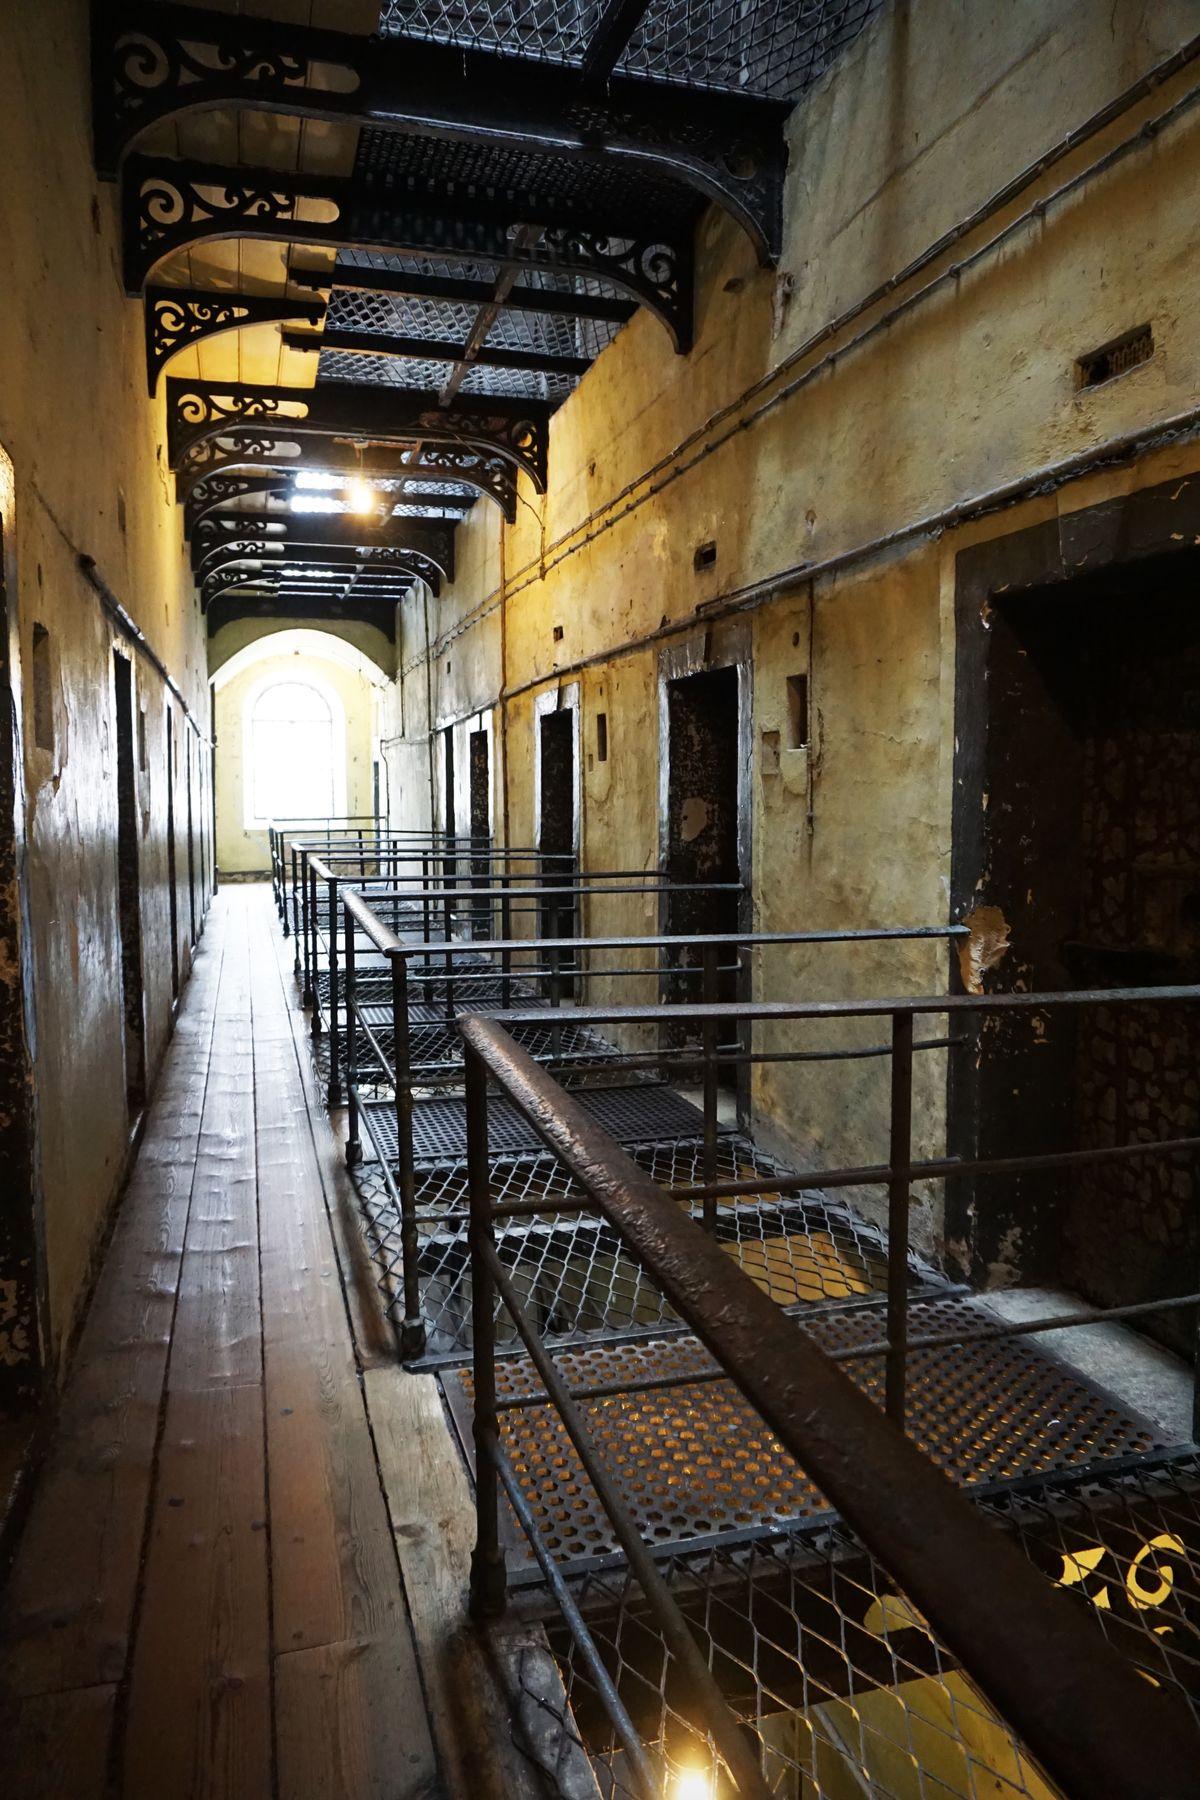 2017 Architecture Built Structure Gaol Indoors  Jail Kilmainham KilmainhamGaol Prison Room キルメイナム キルメイナム刑務所